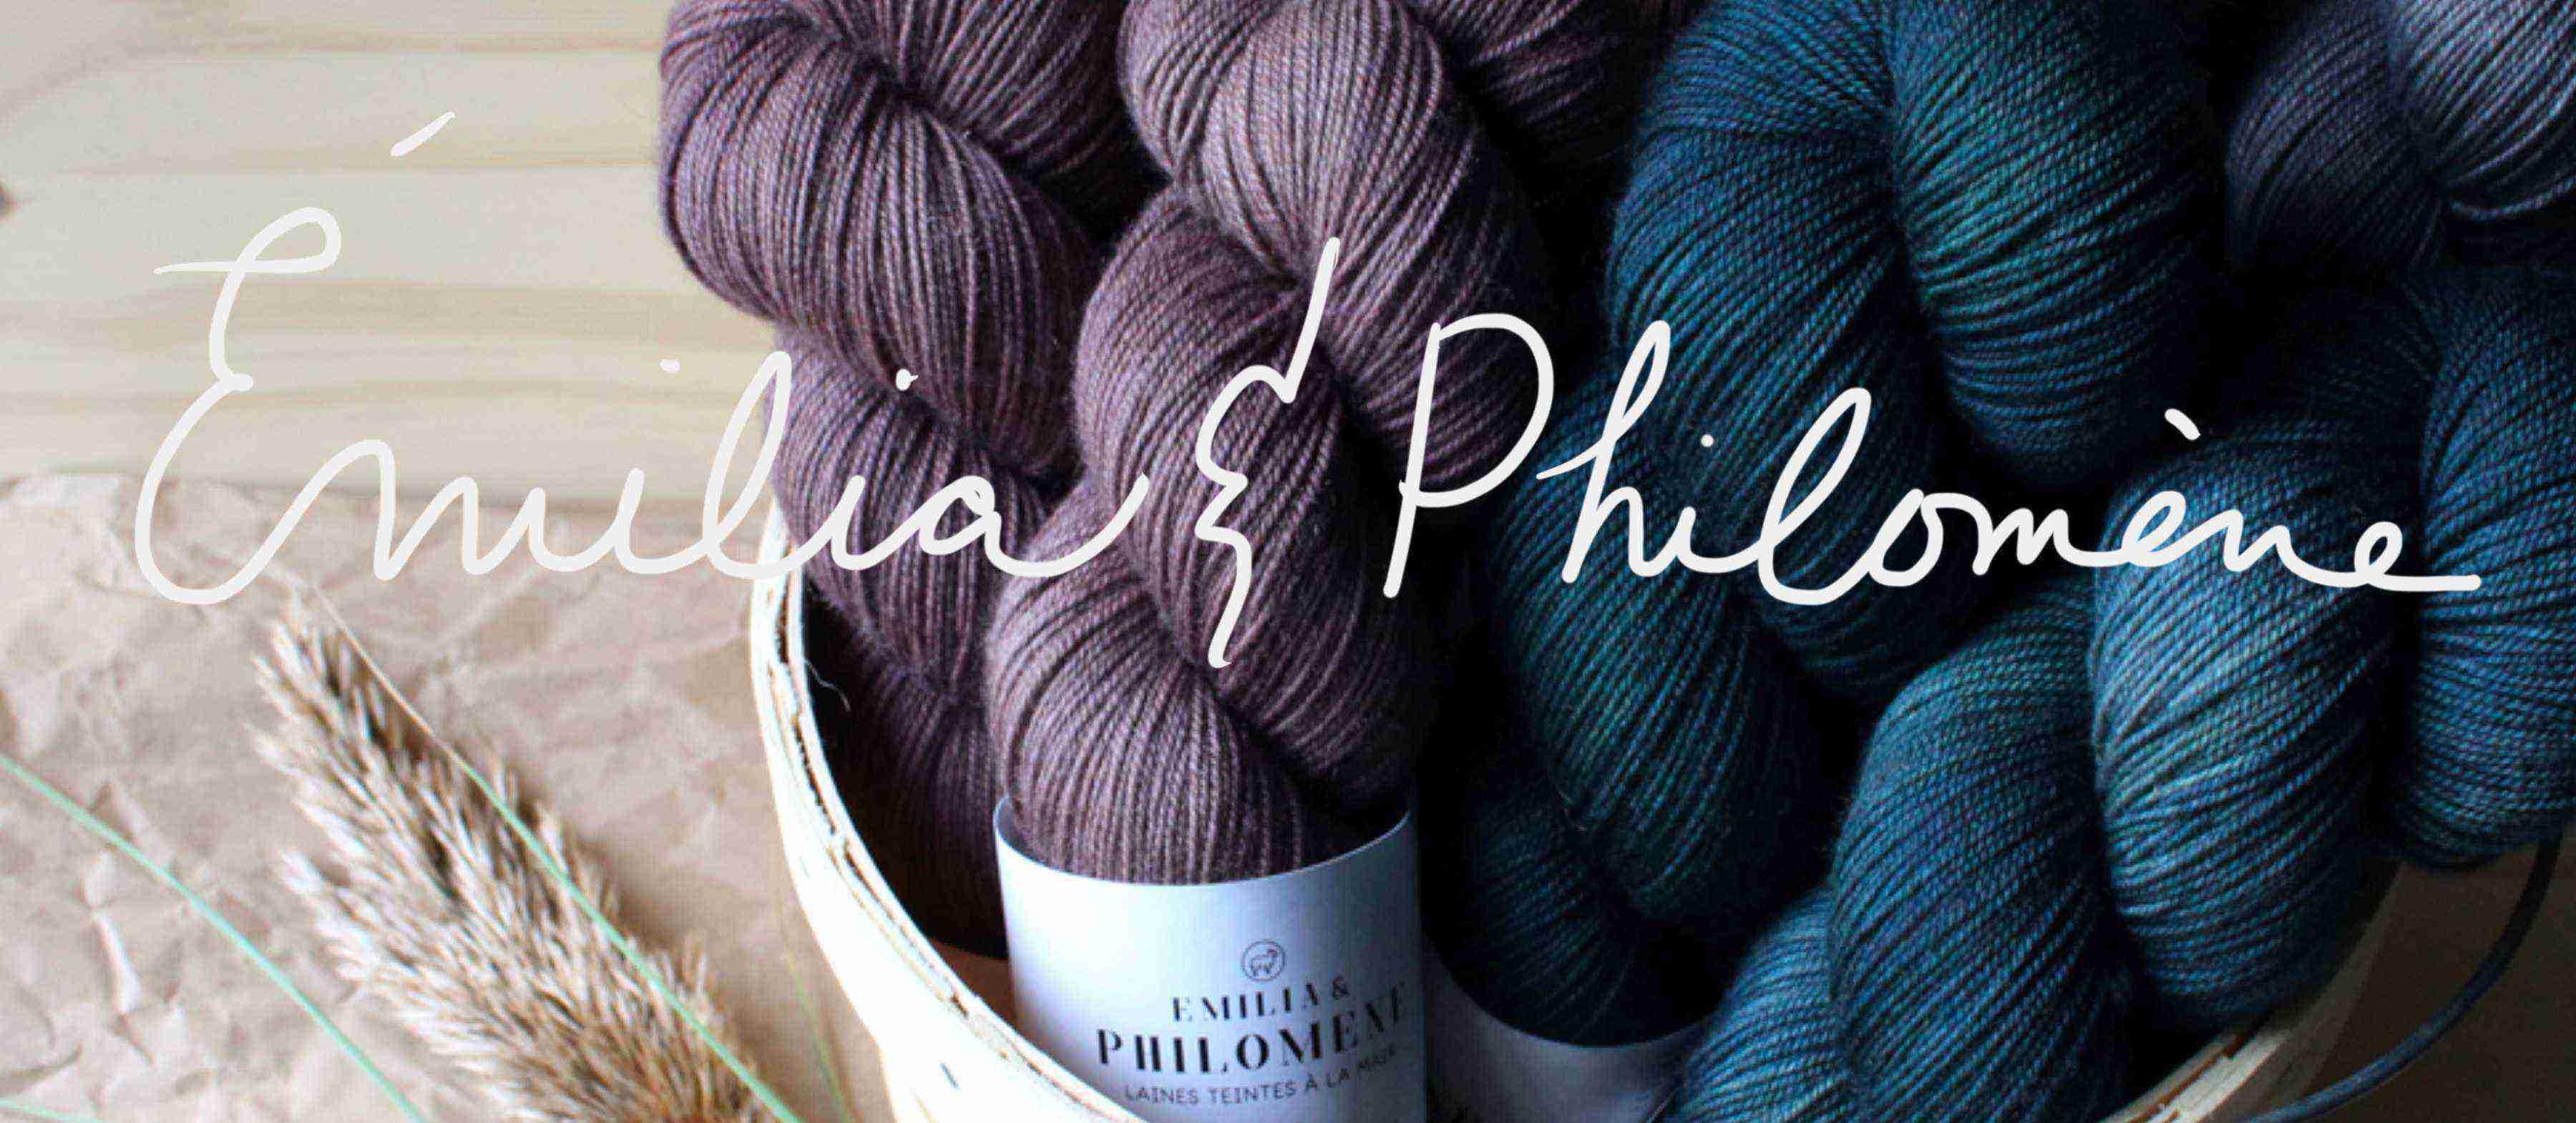 Slider_Emilia-philomene